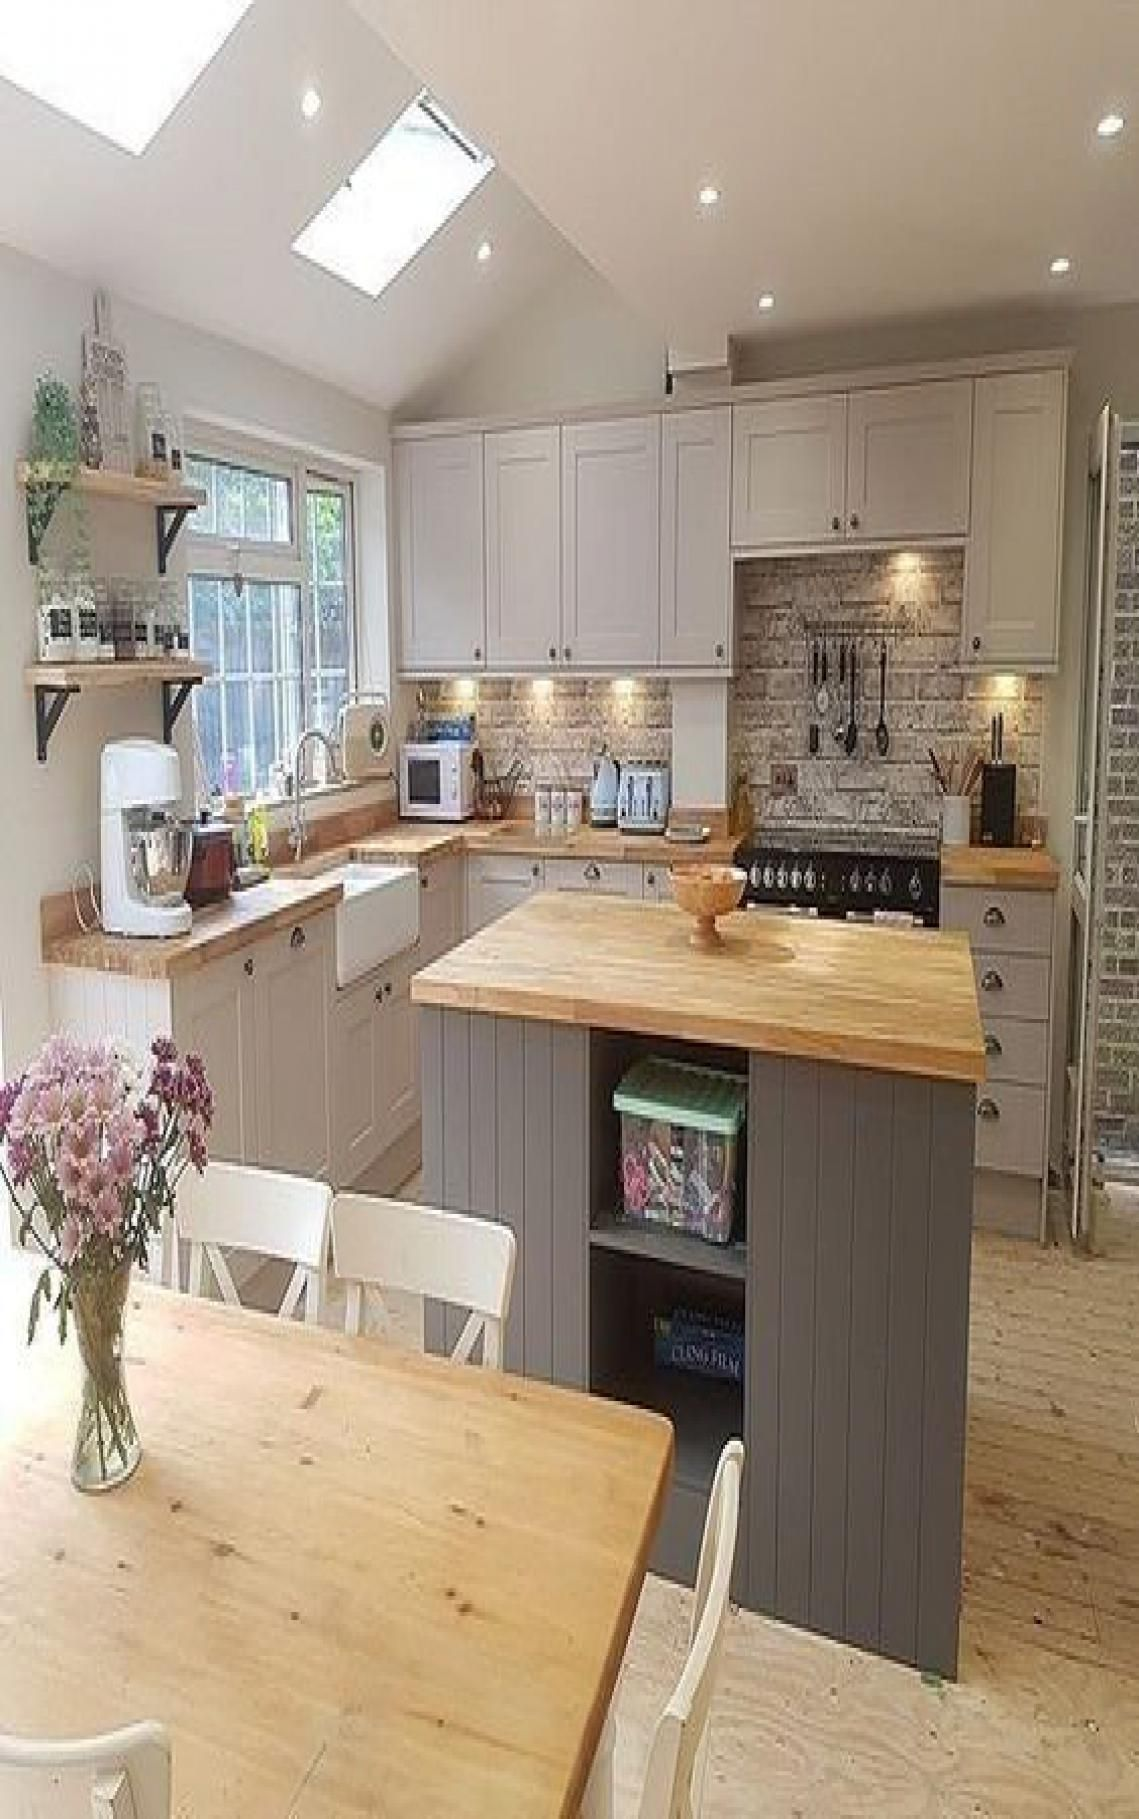 44 Genius Small Cottage Kitchen Design Ideas - Decor